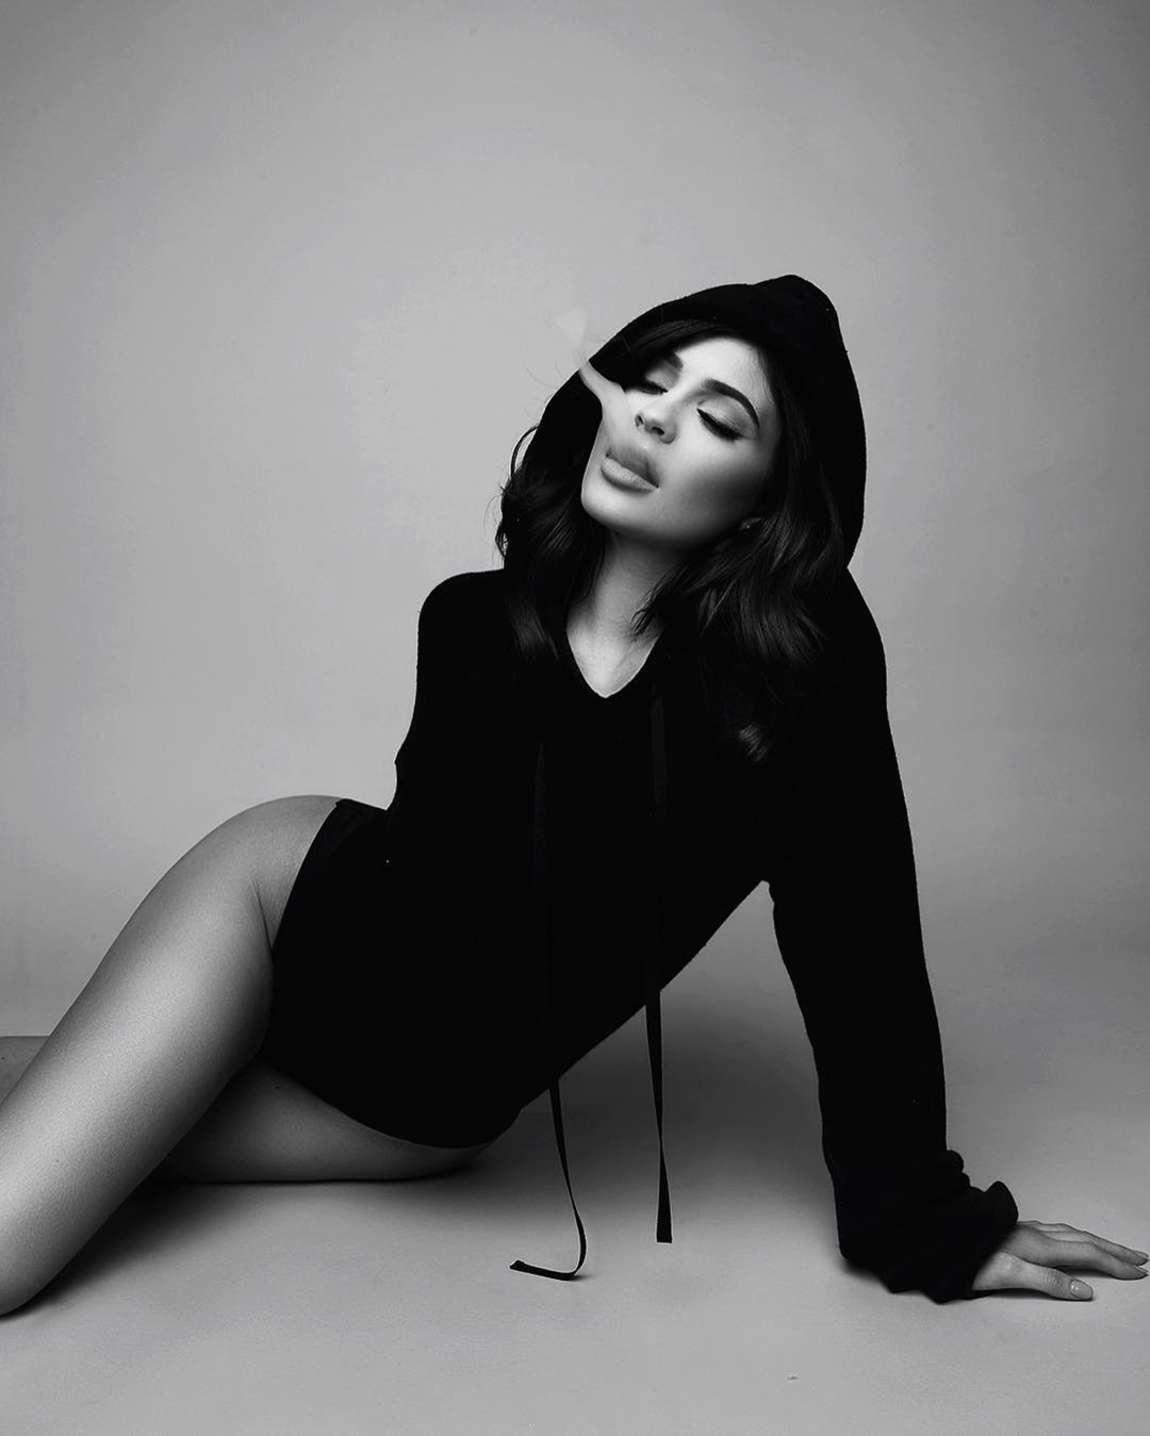 Kylie Jenner, modelo de 18 años